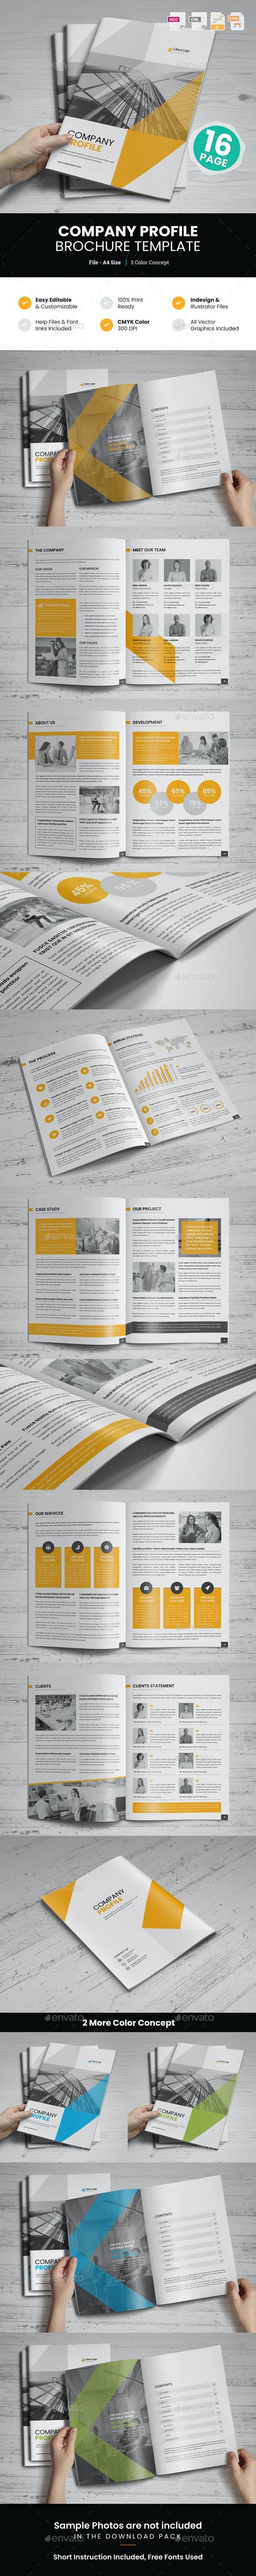 Company Profile Brochure Design v7 - Corporate Brochures